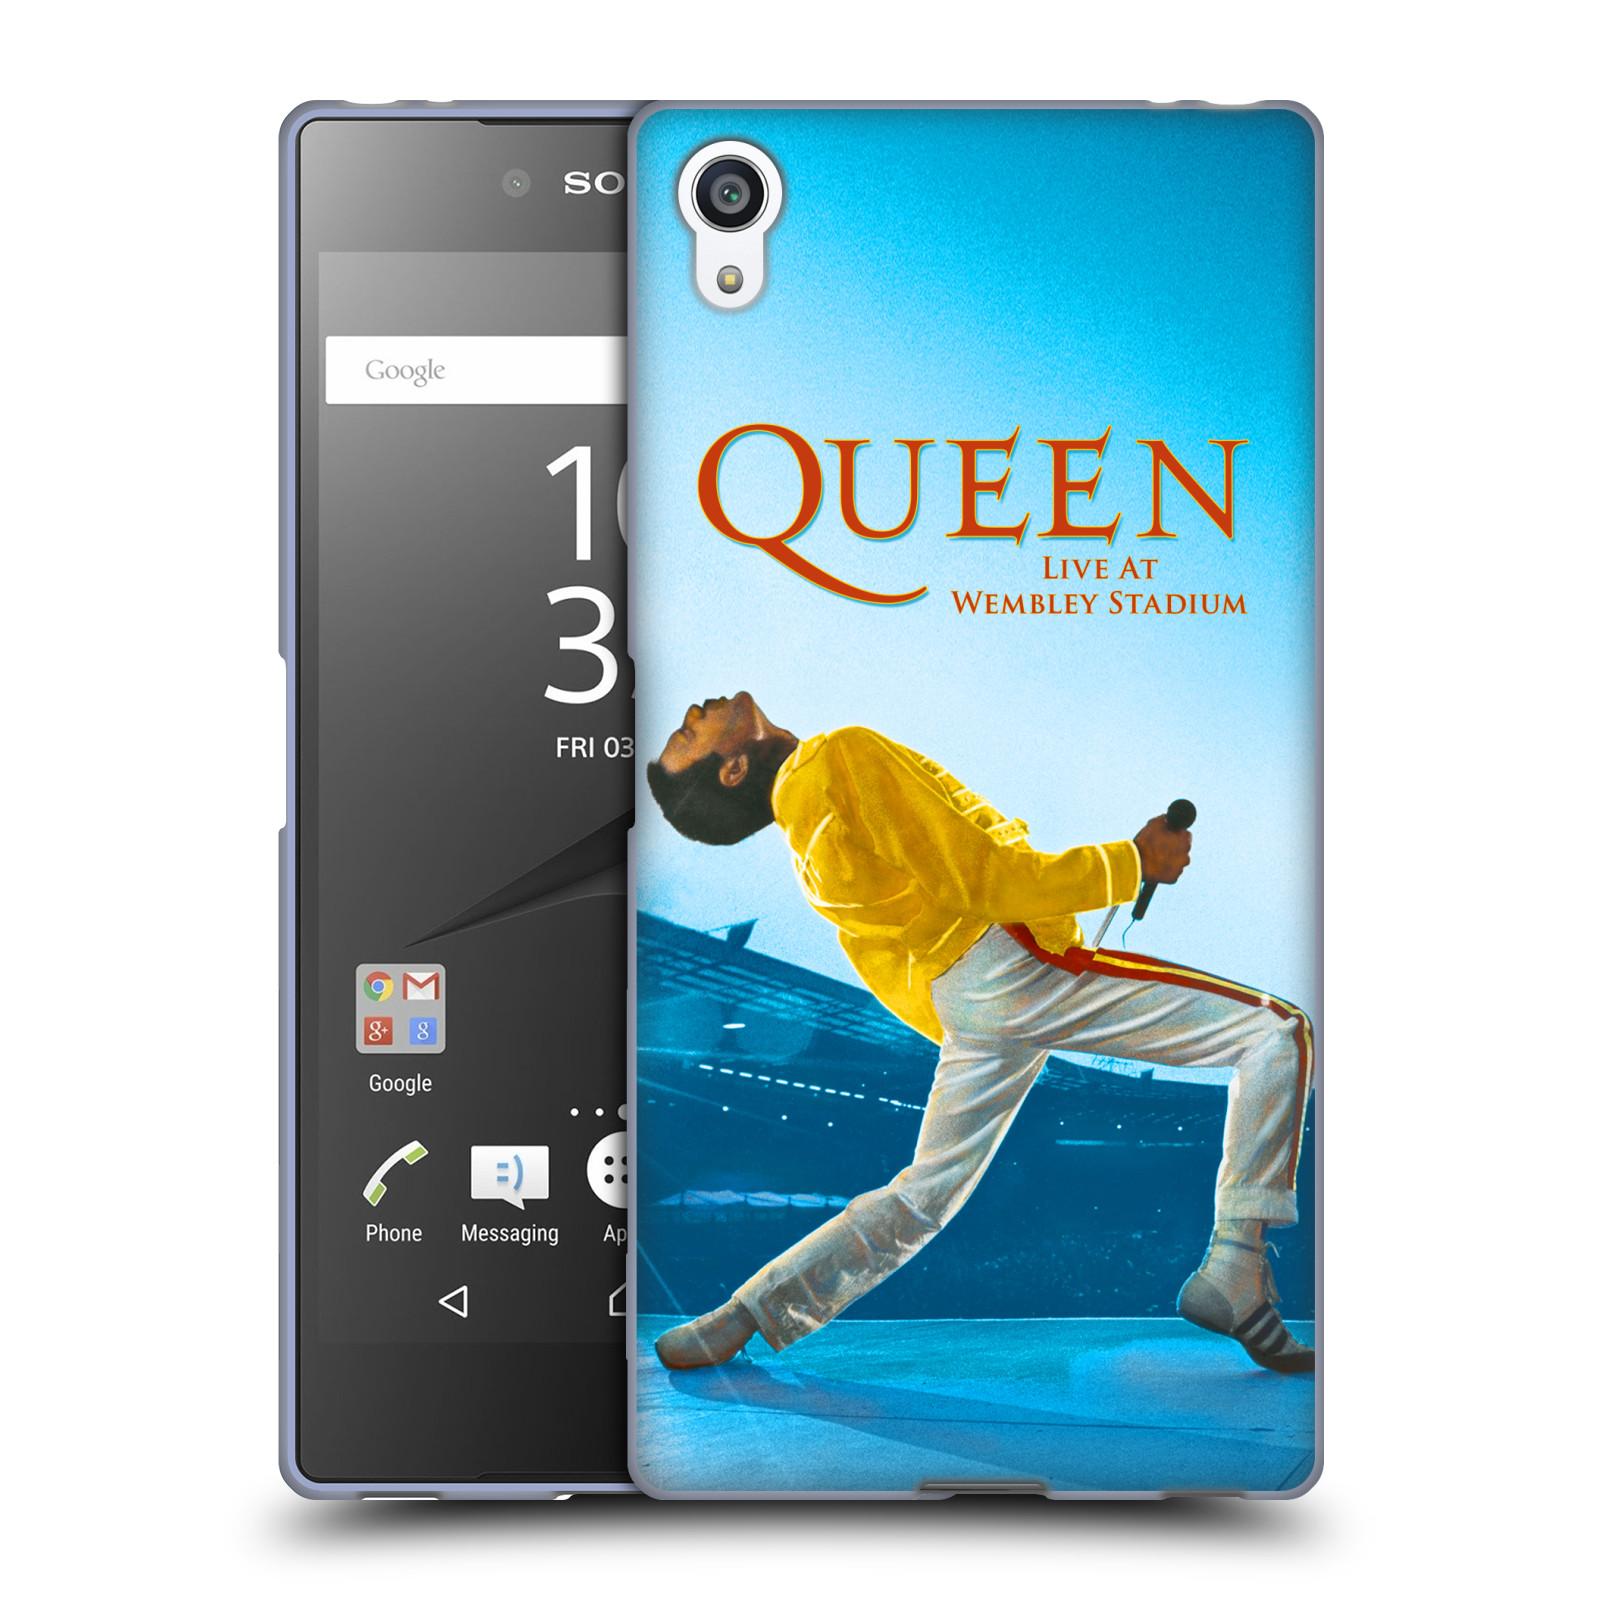 Silikonové pouzdro na mobil Sony Xperia Z5 Premium HEAD CASE Queen - Freddie Mercury